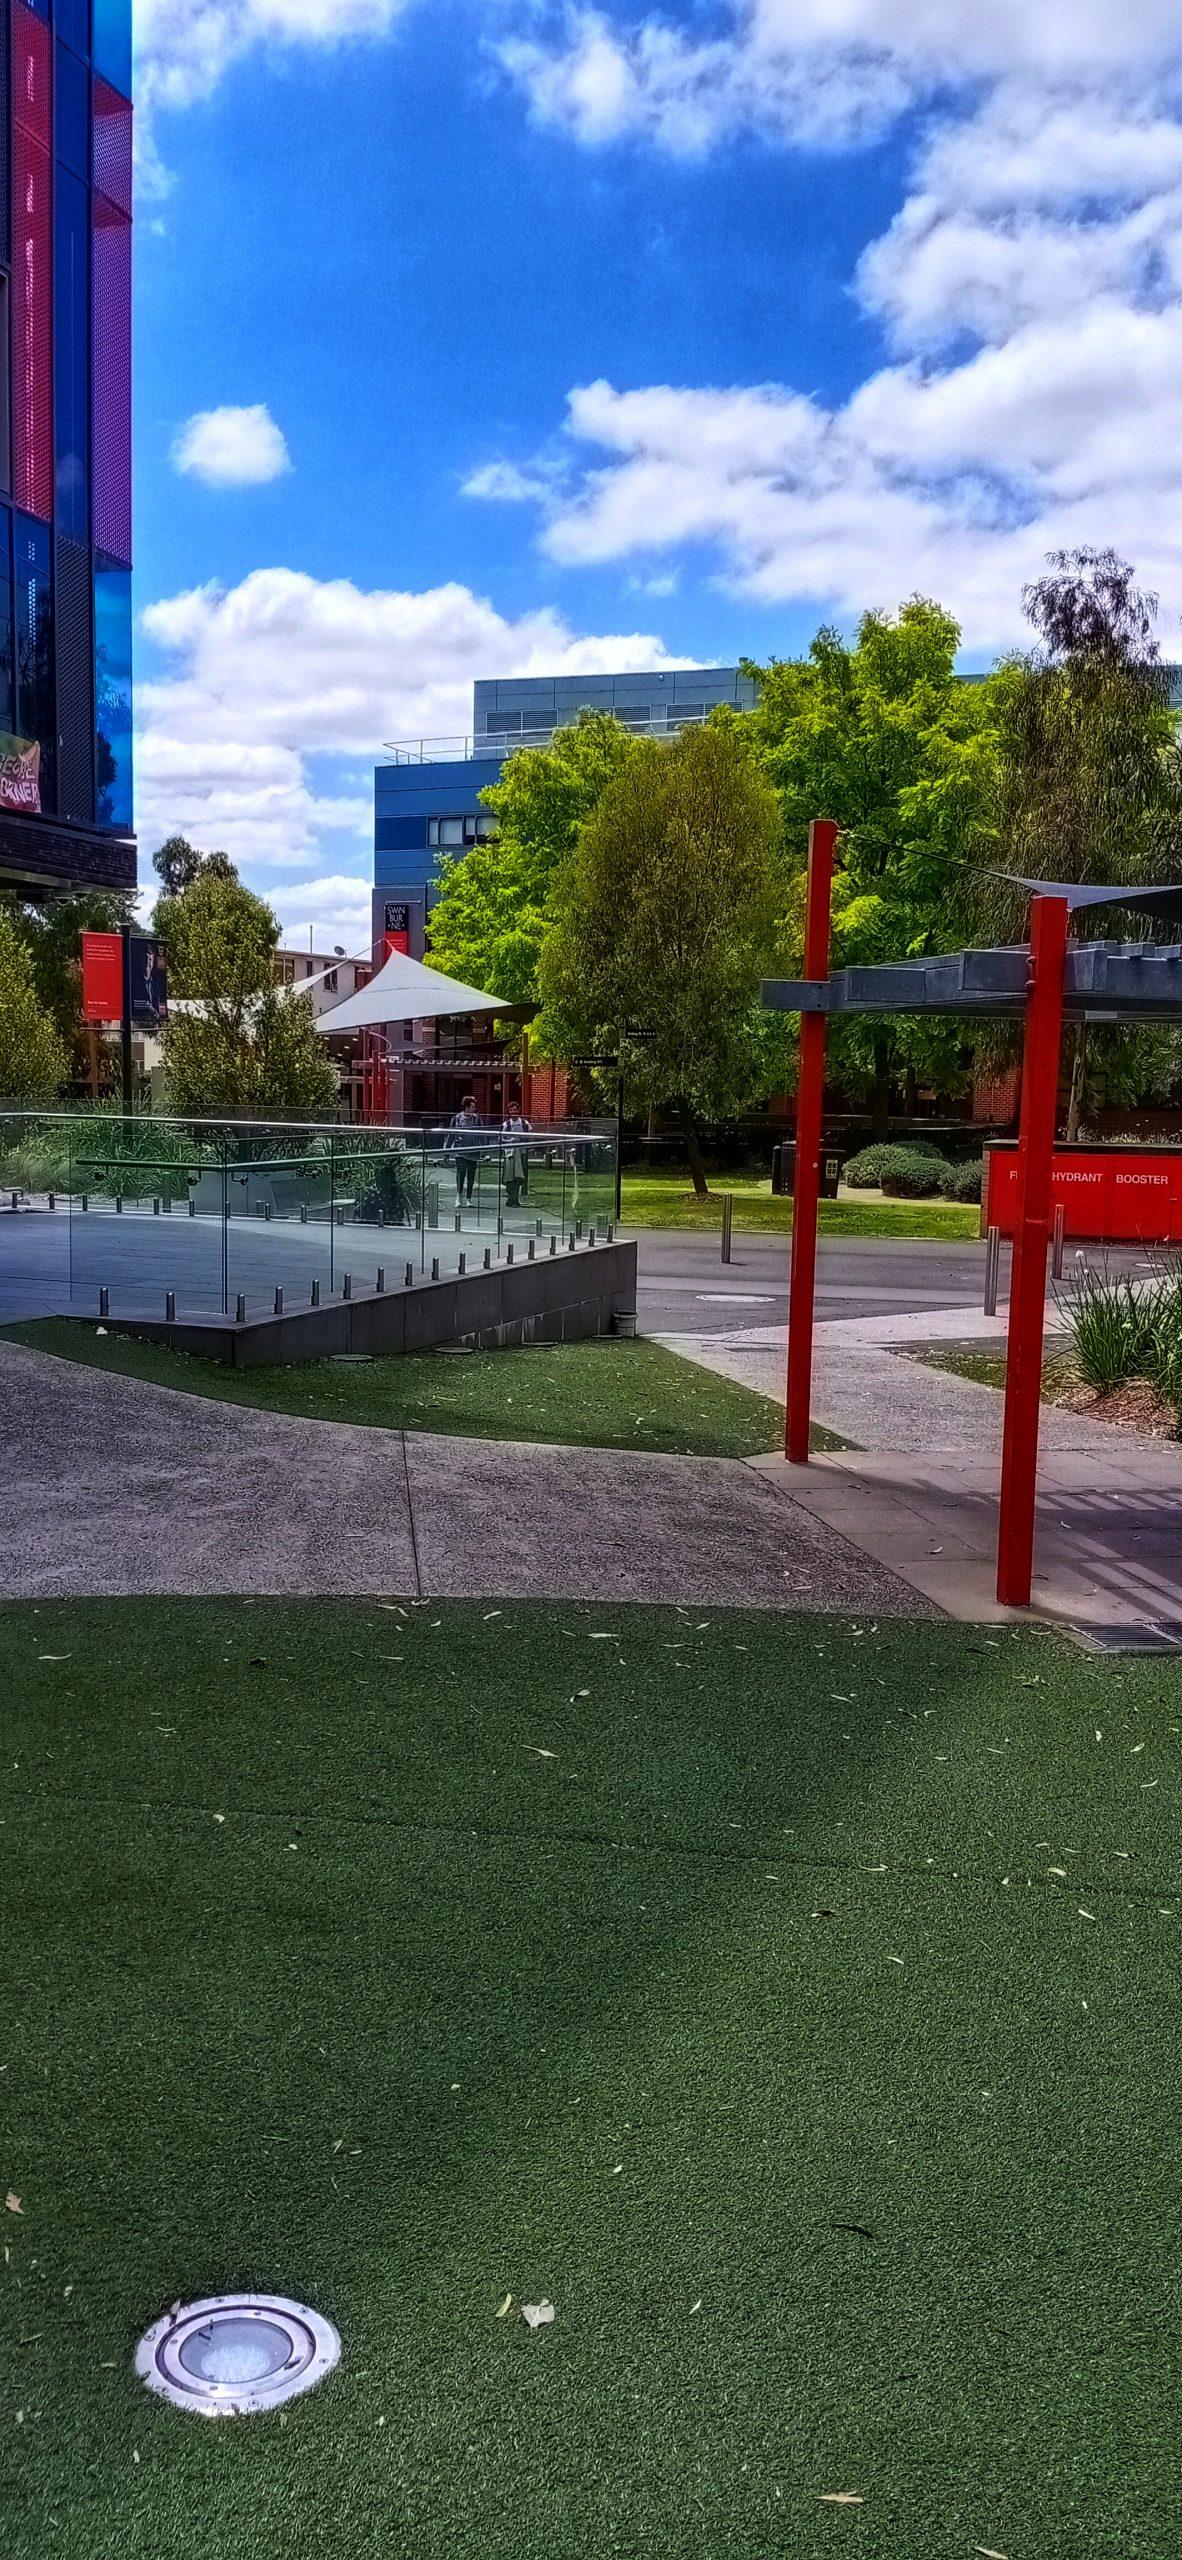 Swinburne university, Australia.